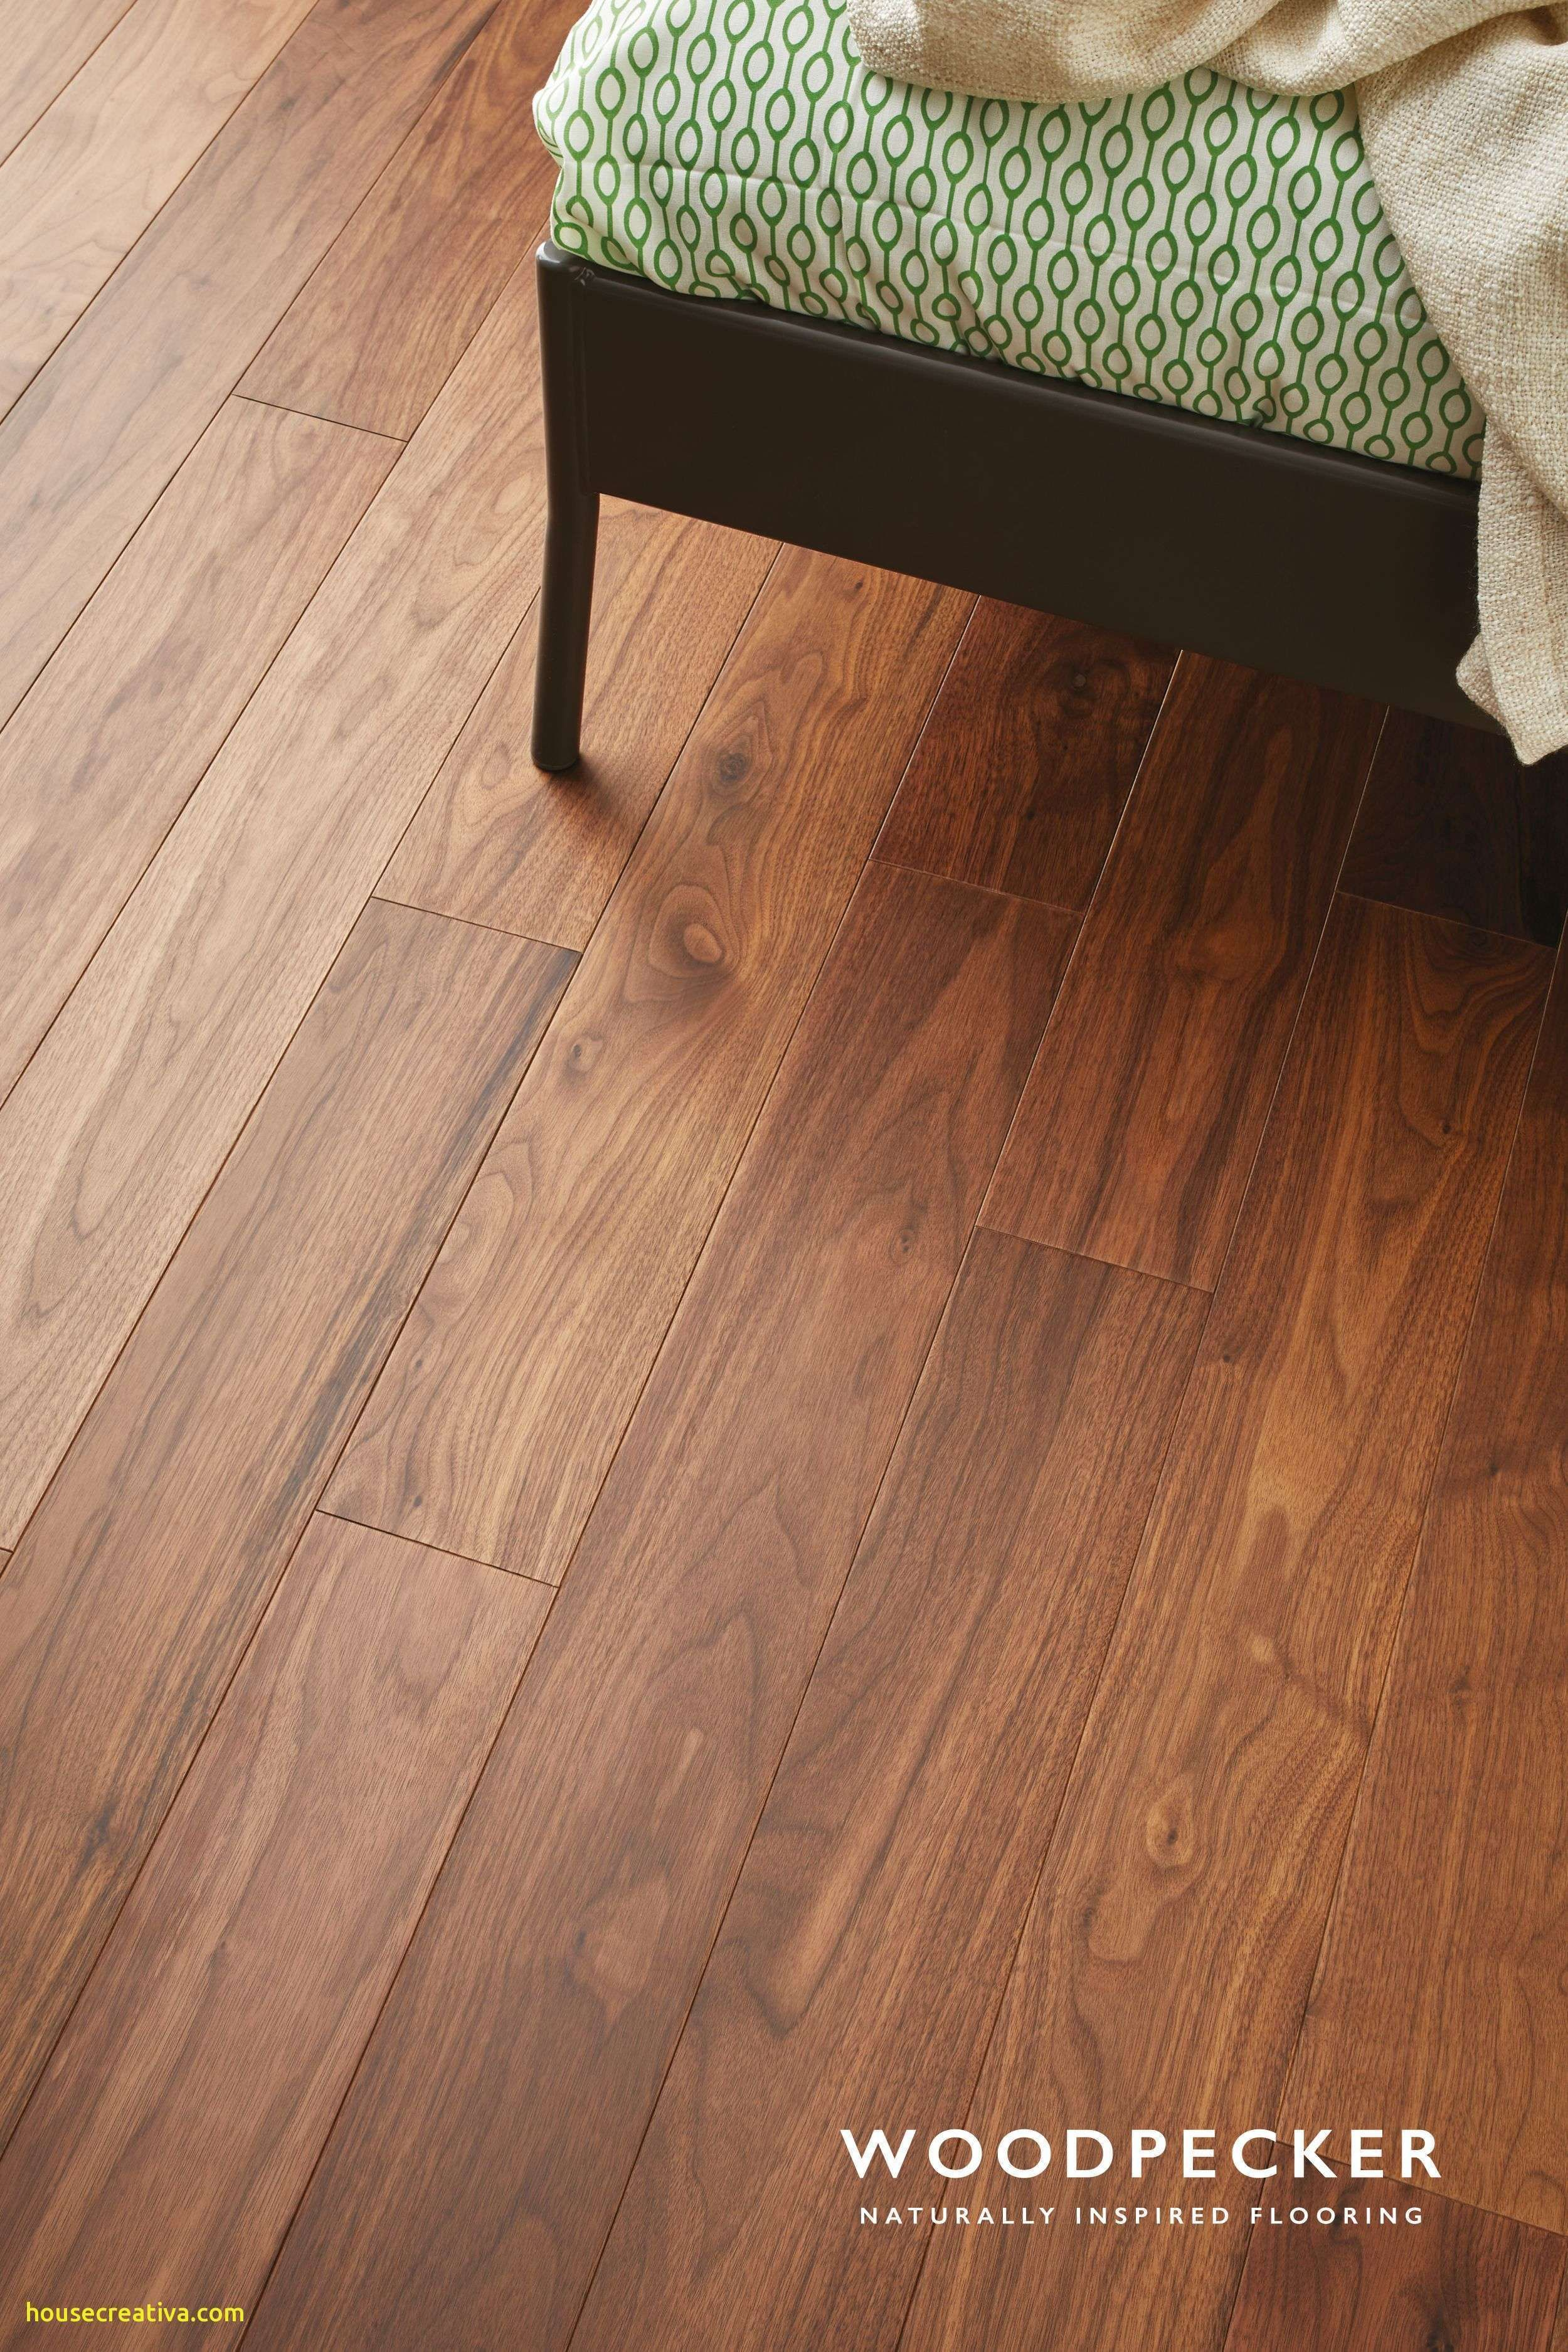 Price To Install Hardwood Floors Per Square Foot Cost Of Laminate Flooring Engineered Wood Floors Flooring